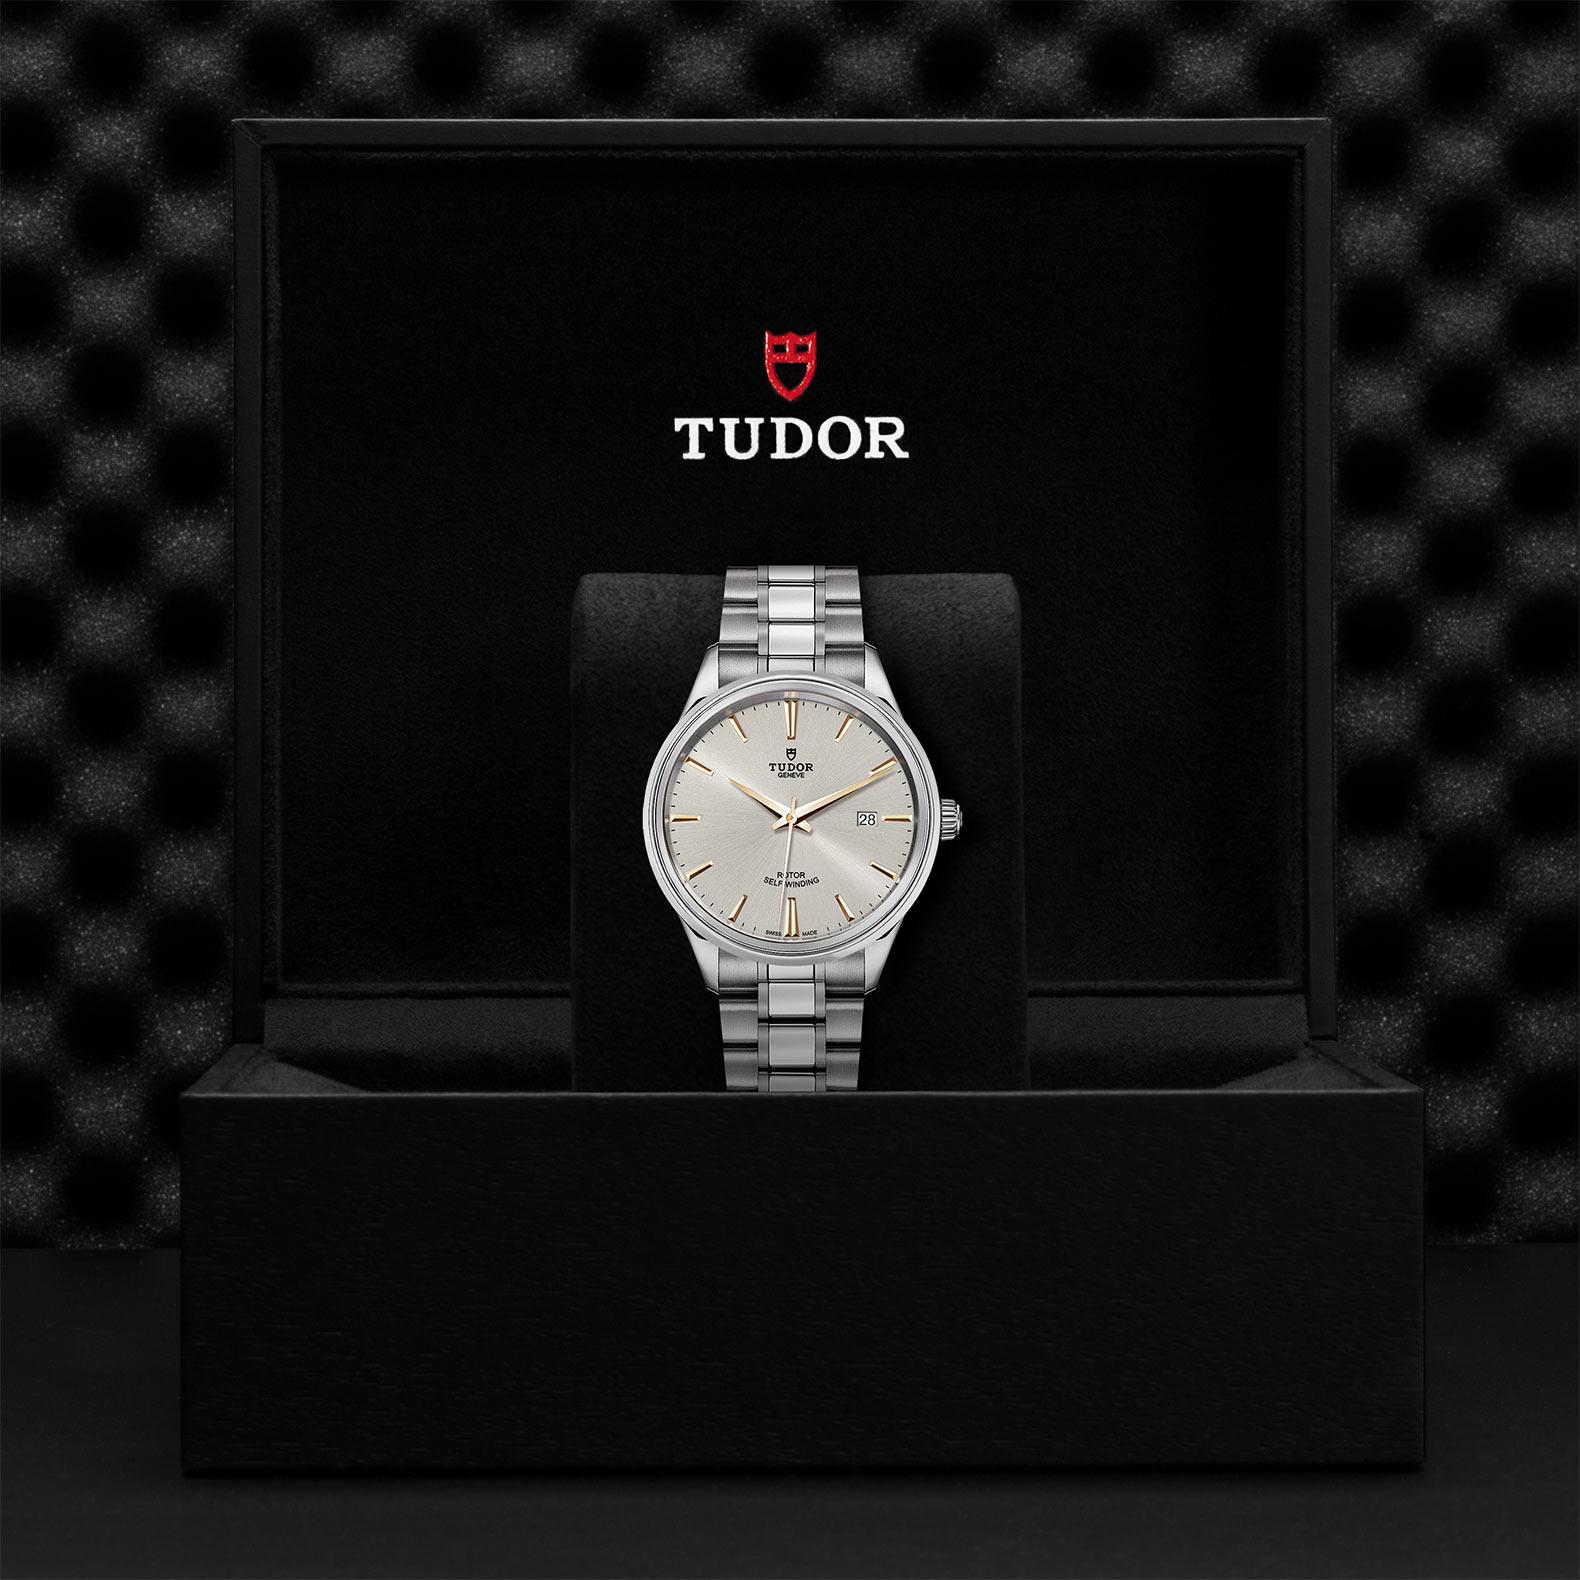 TUDOR Style M12700 0017 Presentationbox